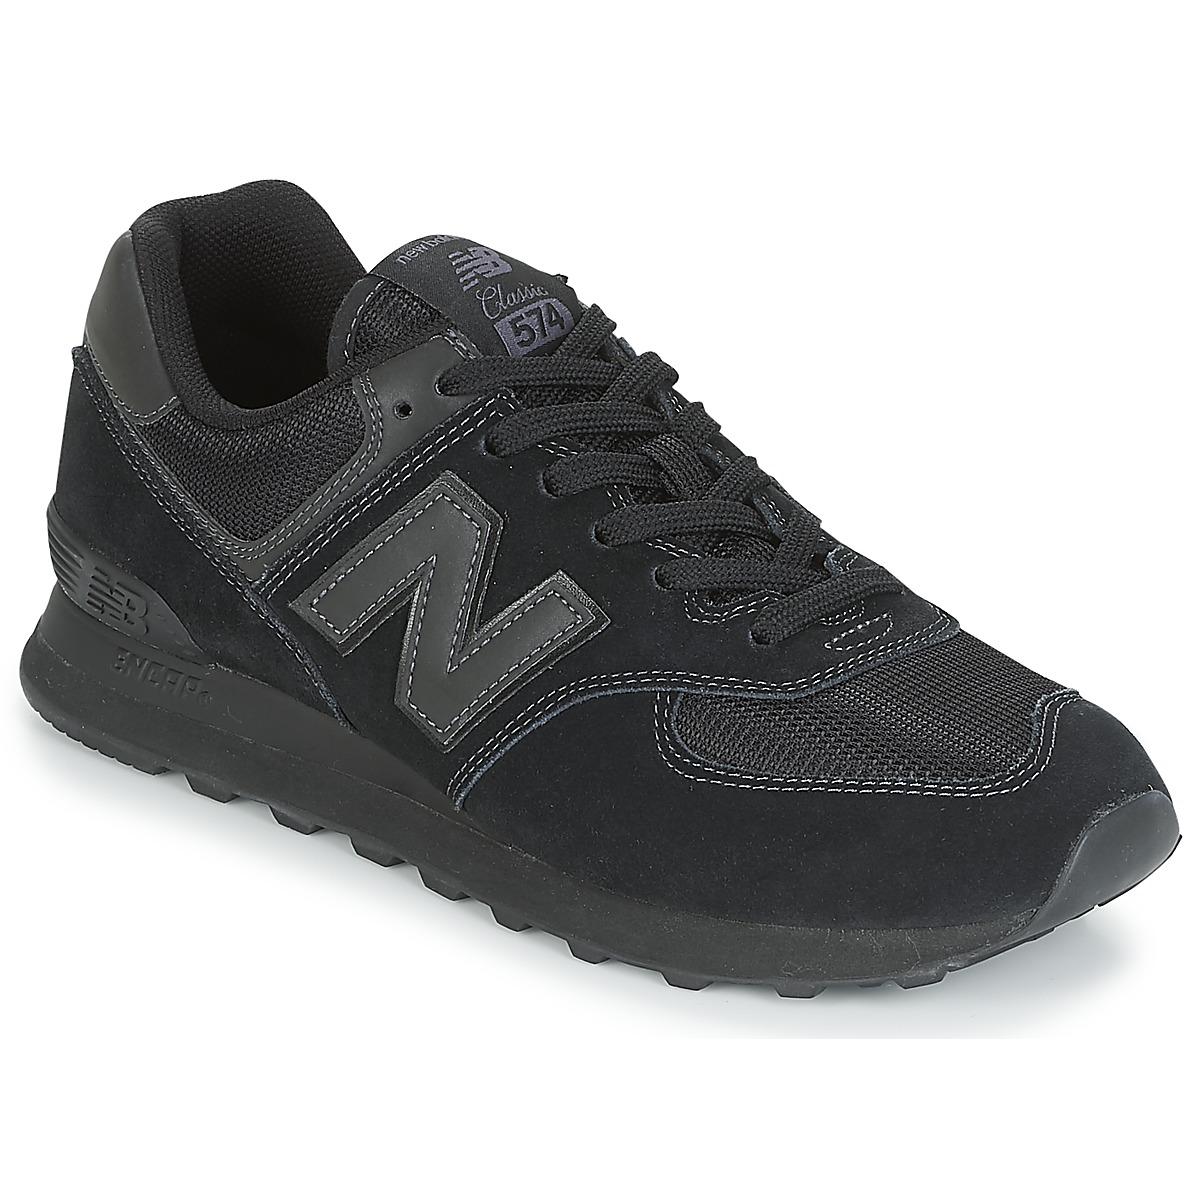 New Balance 574 Core Shoes - Blackout